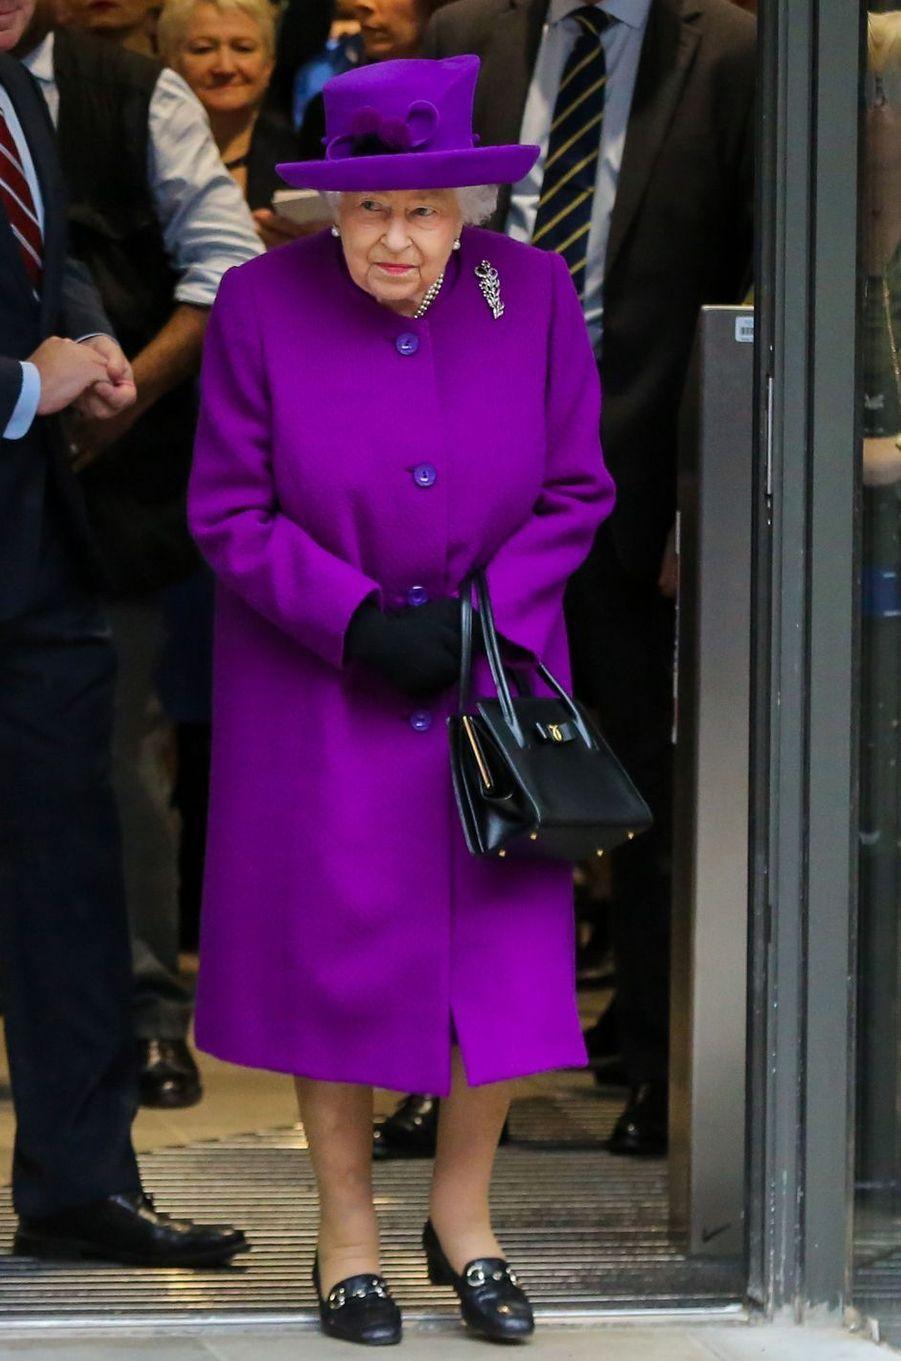 La reine Elizabeth II, le 19 février 2020